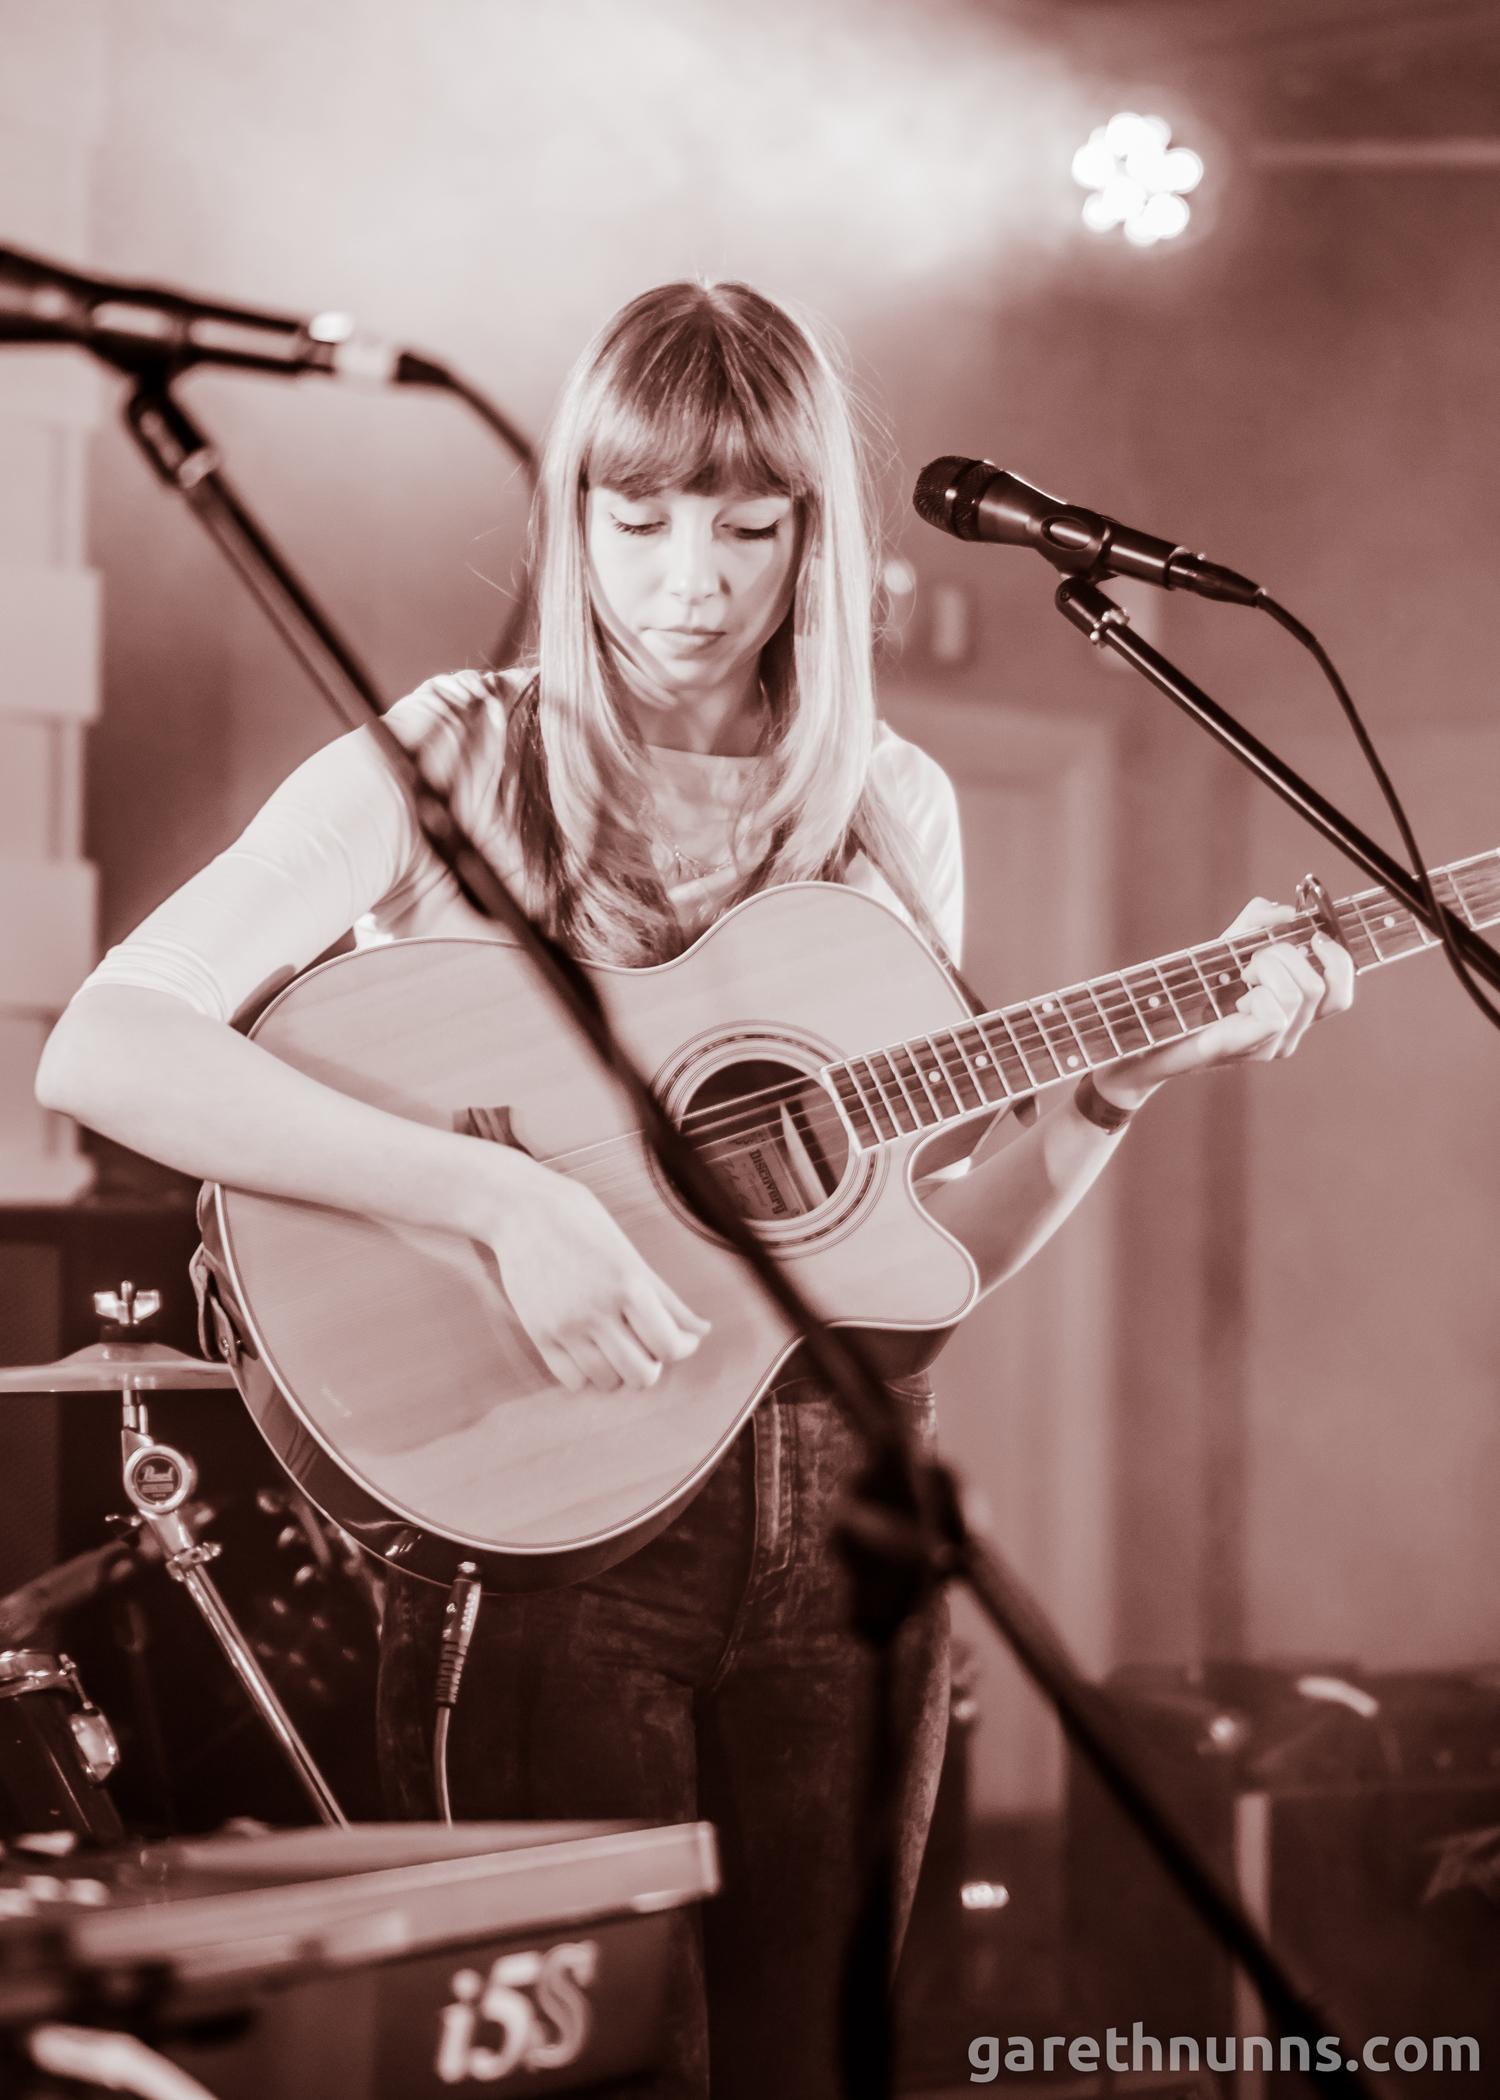 Rachel Clark - The Portland Arms - Gareth Nunns - 02.jpg